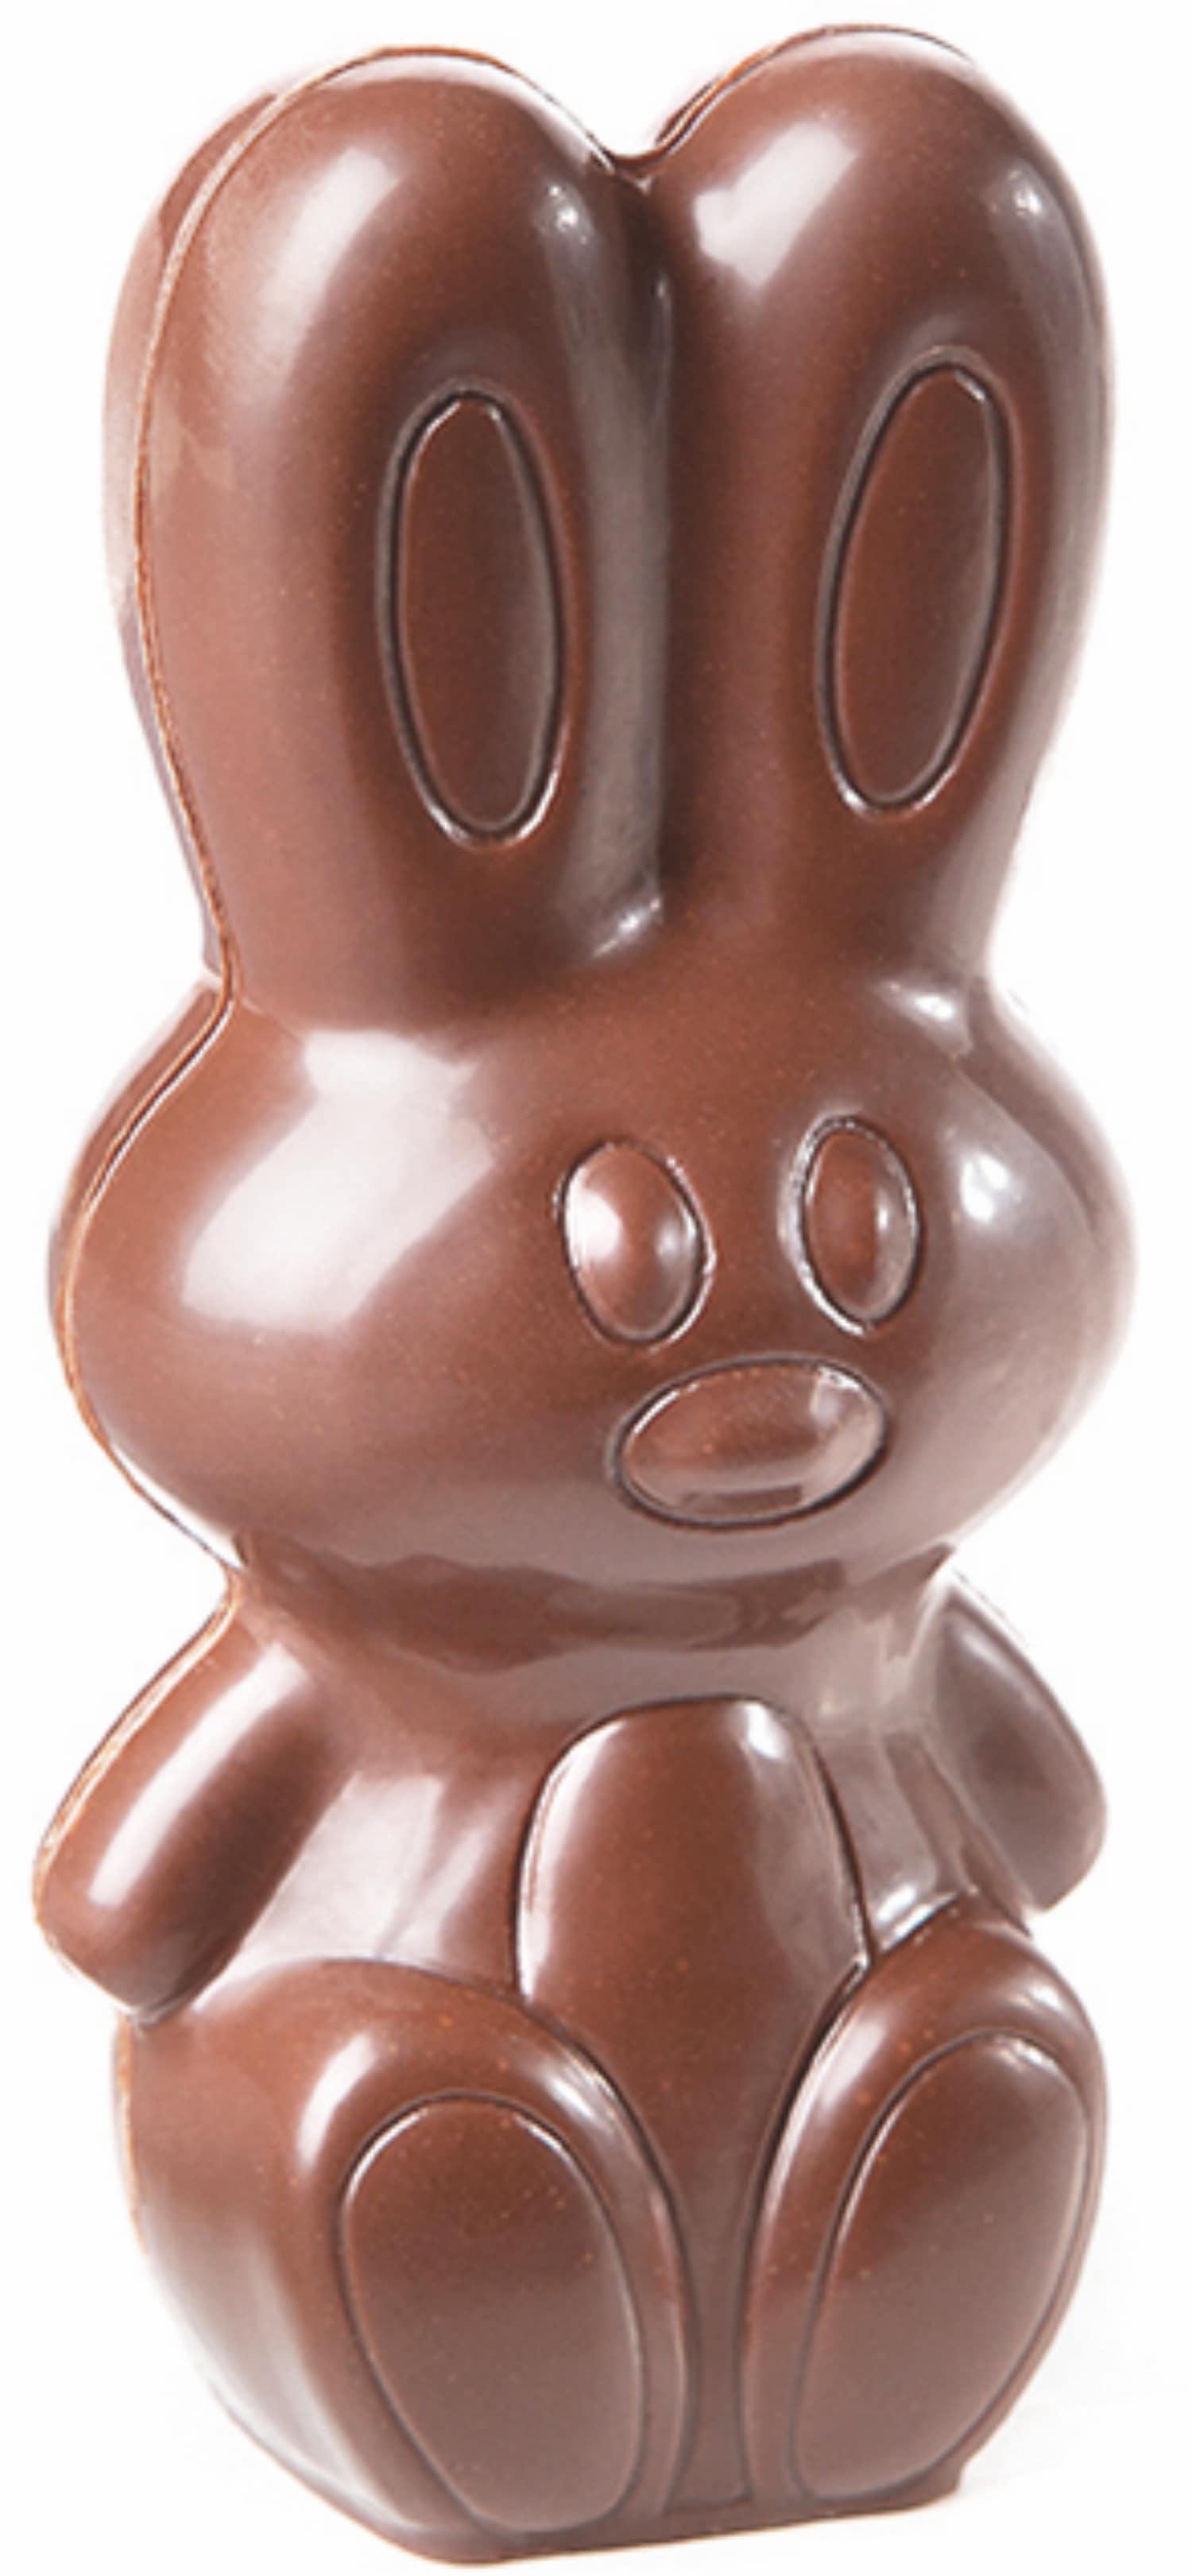 "Schokoladenform ""Hase"" 421739"